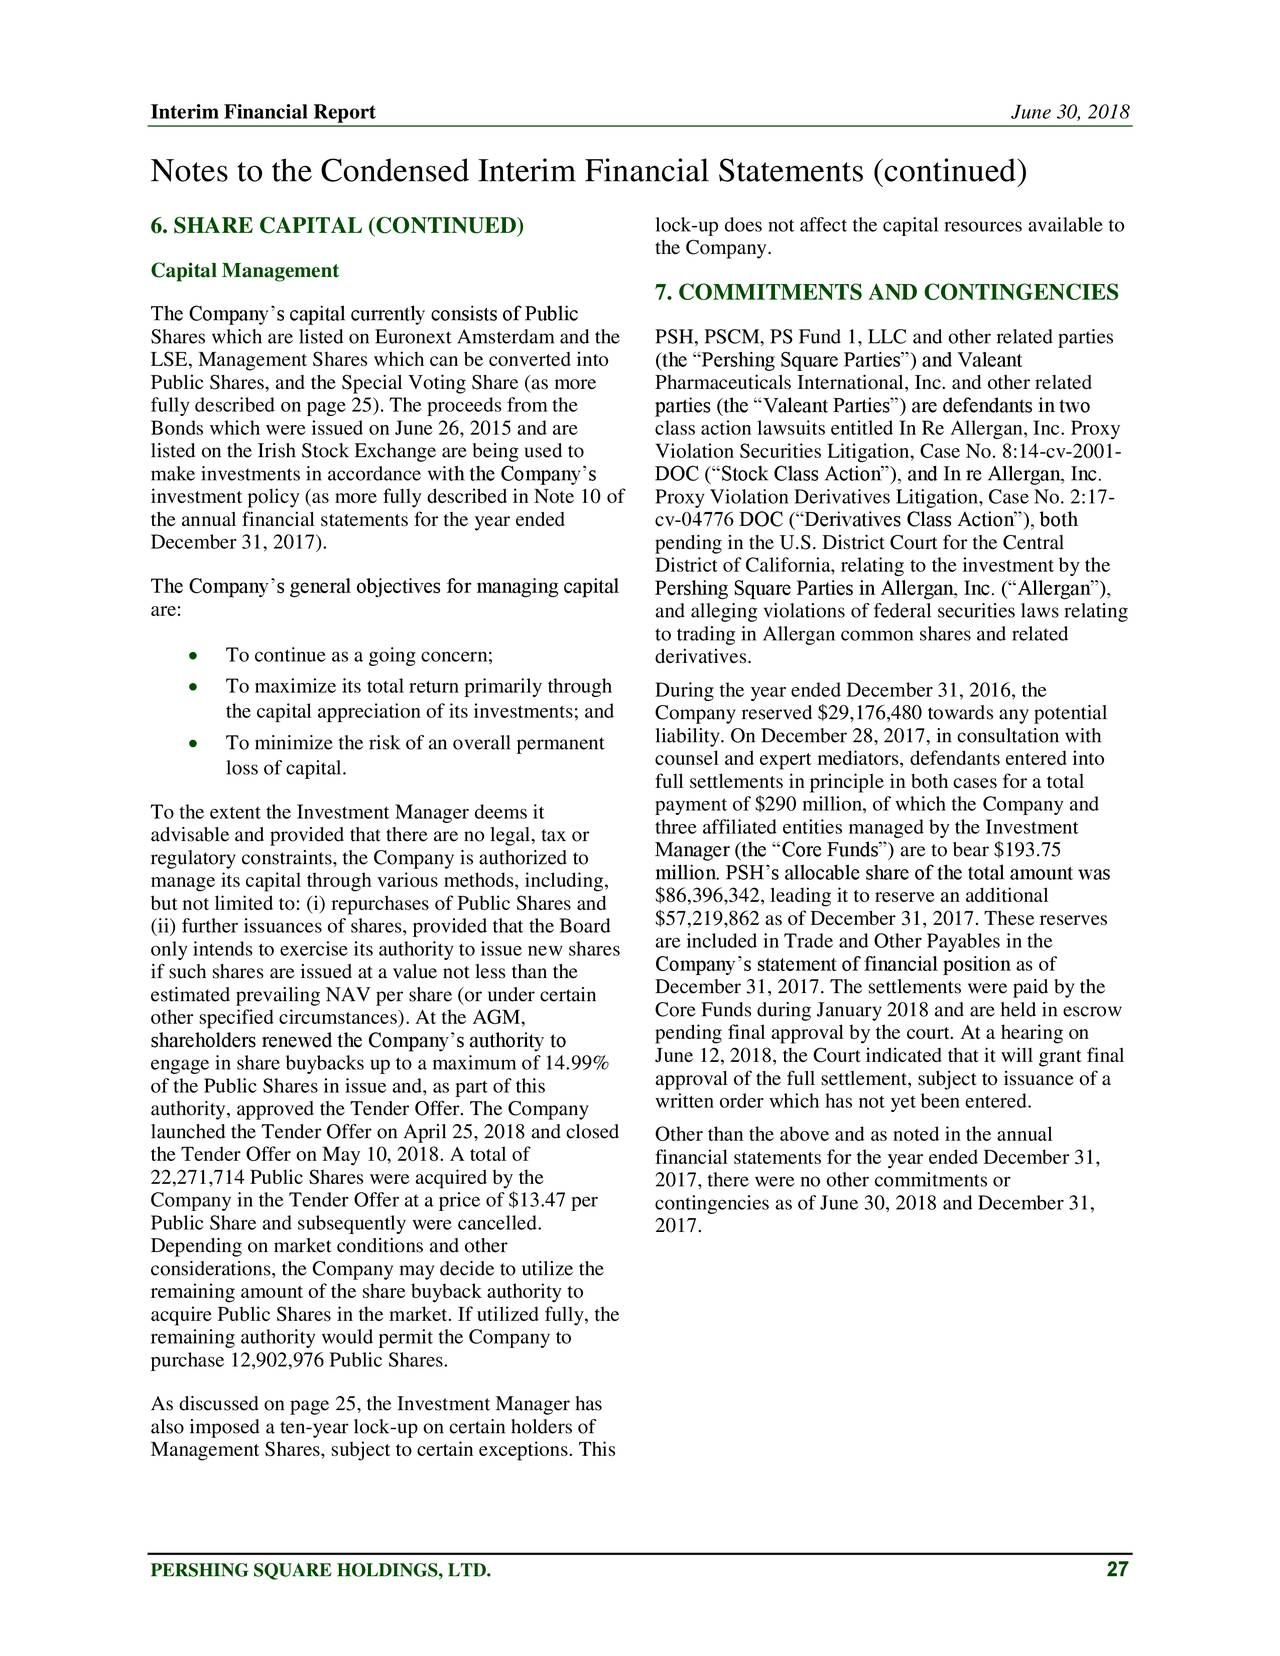 pershing square  bill ackman  2018 interim financial statements